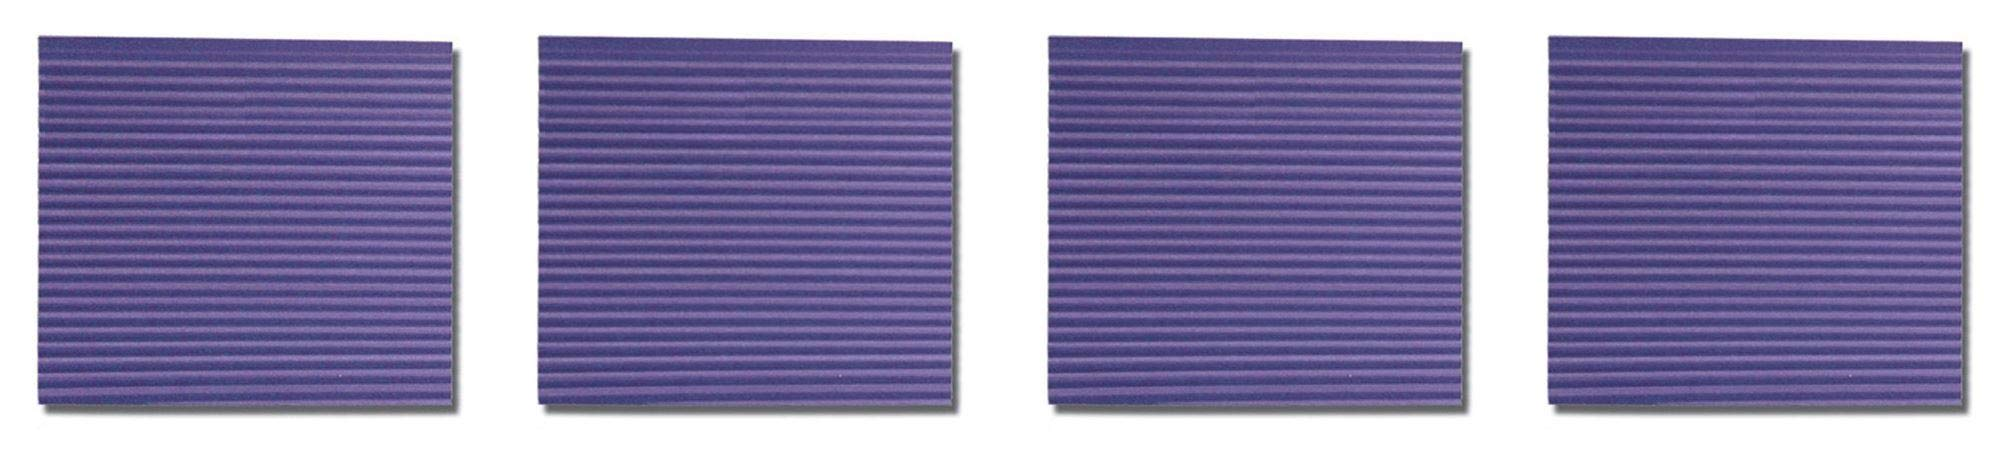 UCHIDA Corru-Gator Paper Crimper, 8-1/2-Inch, Straight (Fоur Paсk)